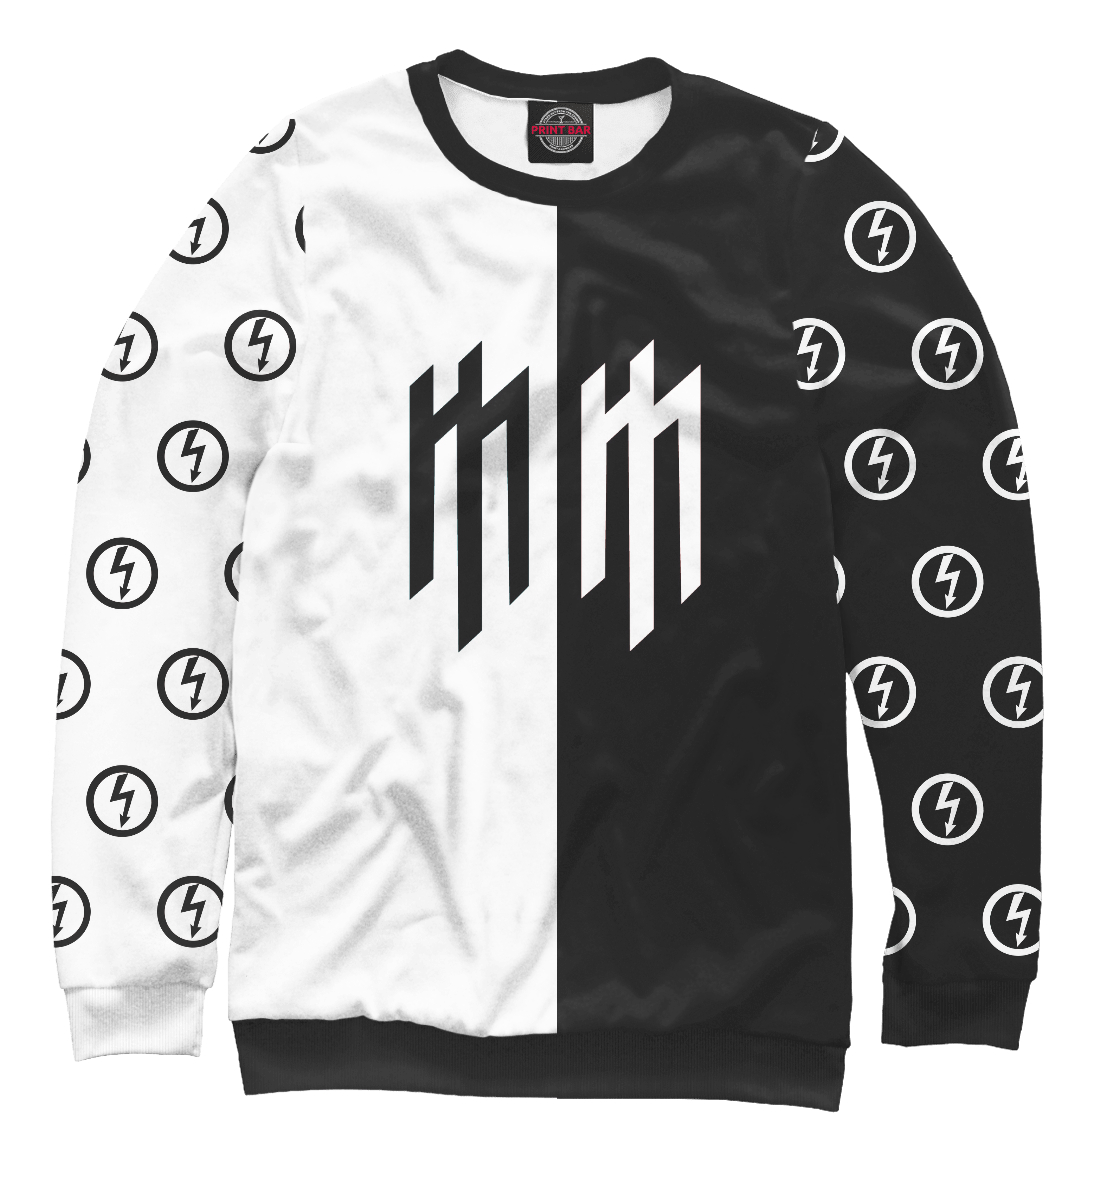 Купить Marilyn Manson, Printbar, Свитшоты, MRM-708311-swi-2